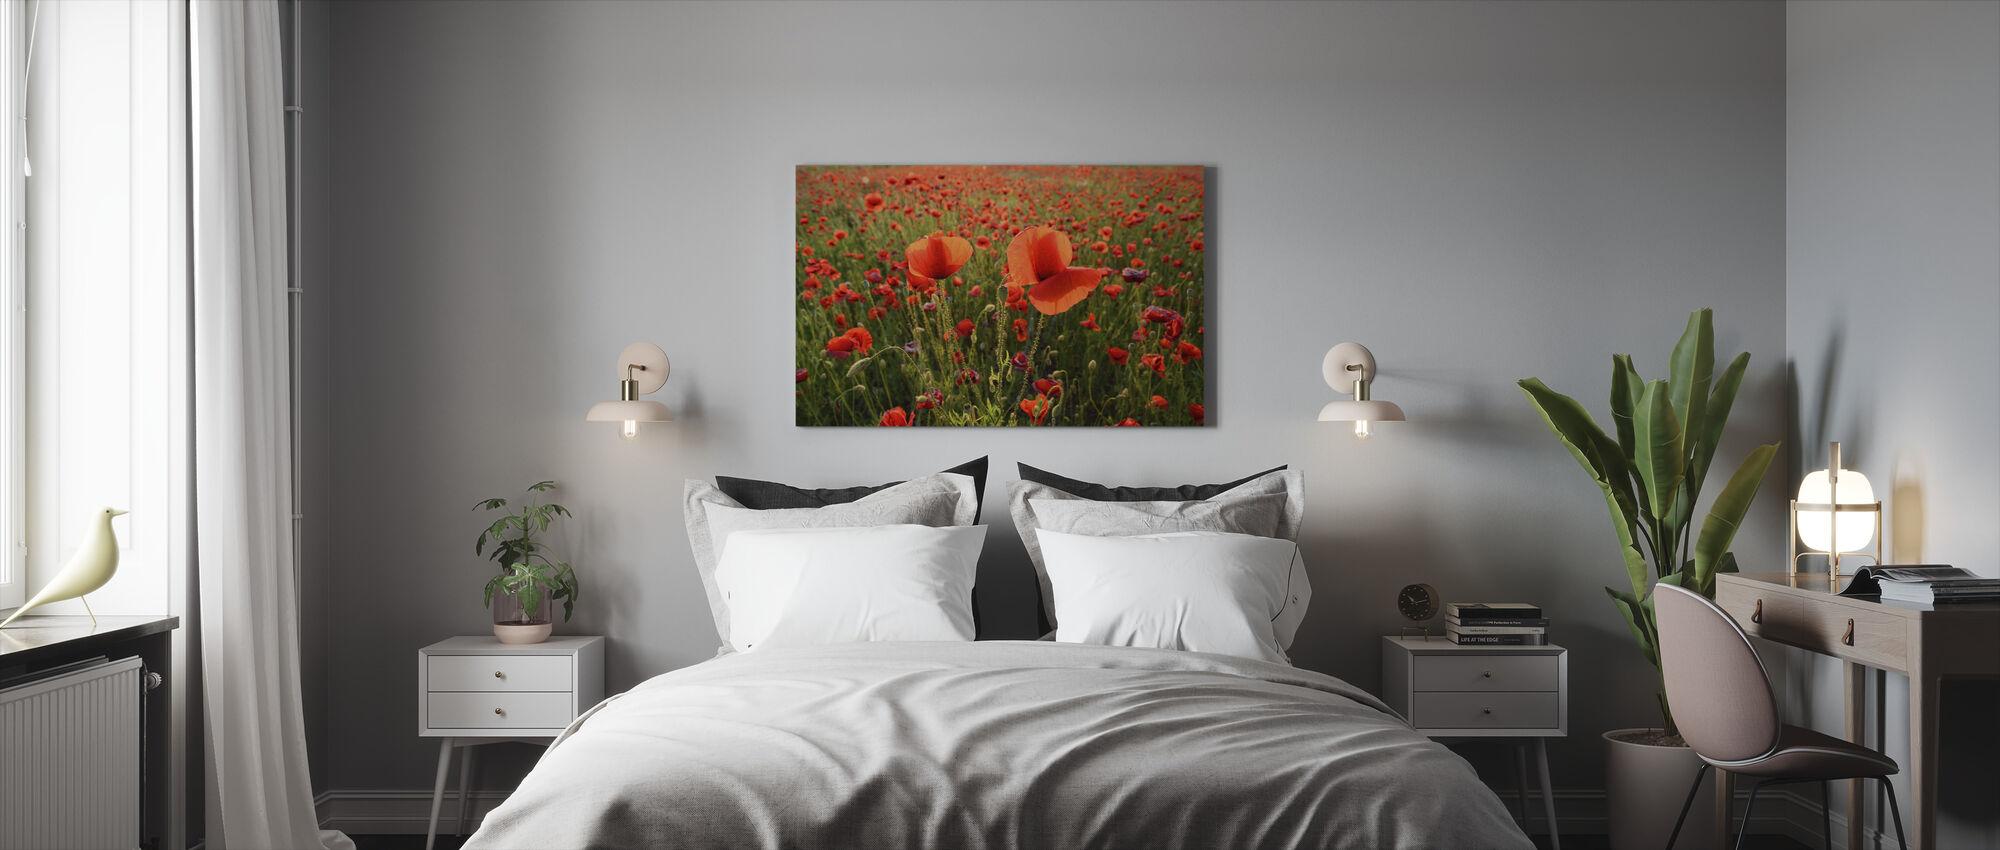 Poppy Fields - Canvas print - Bedroom